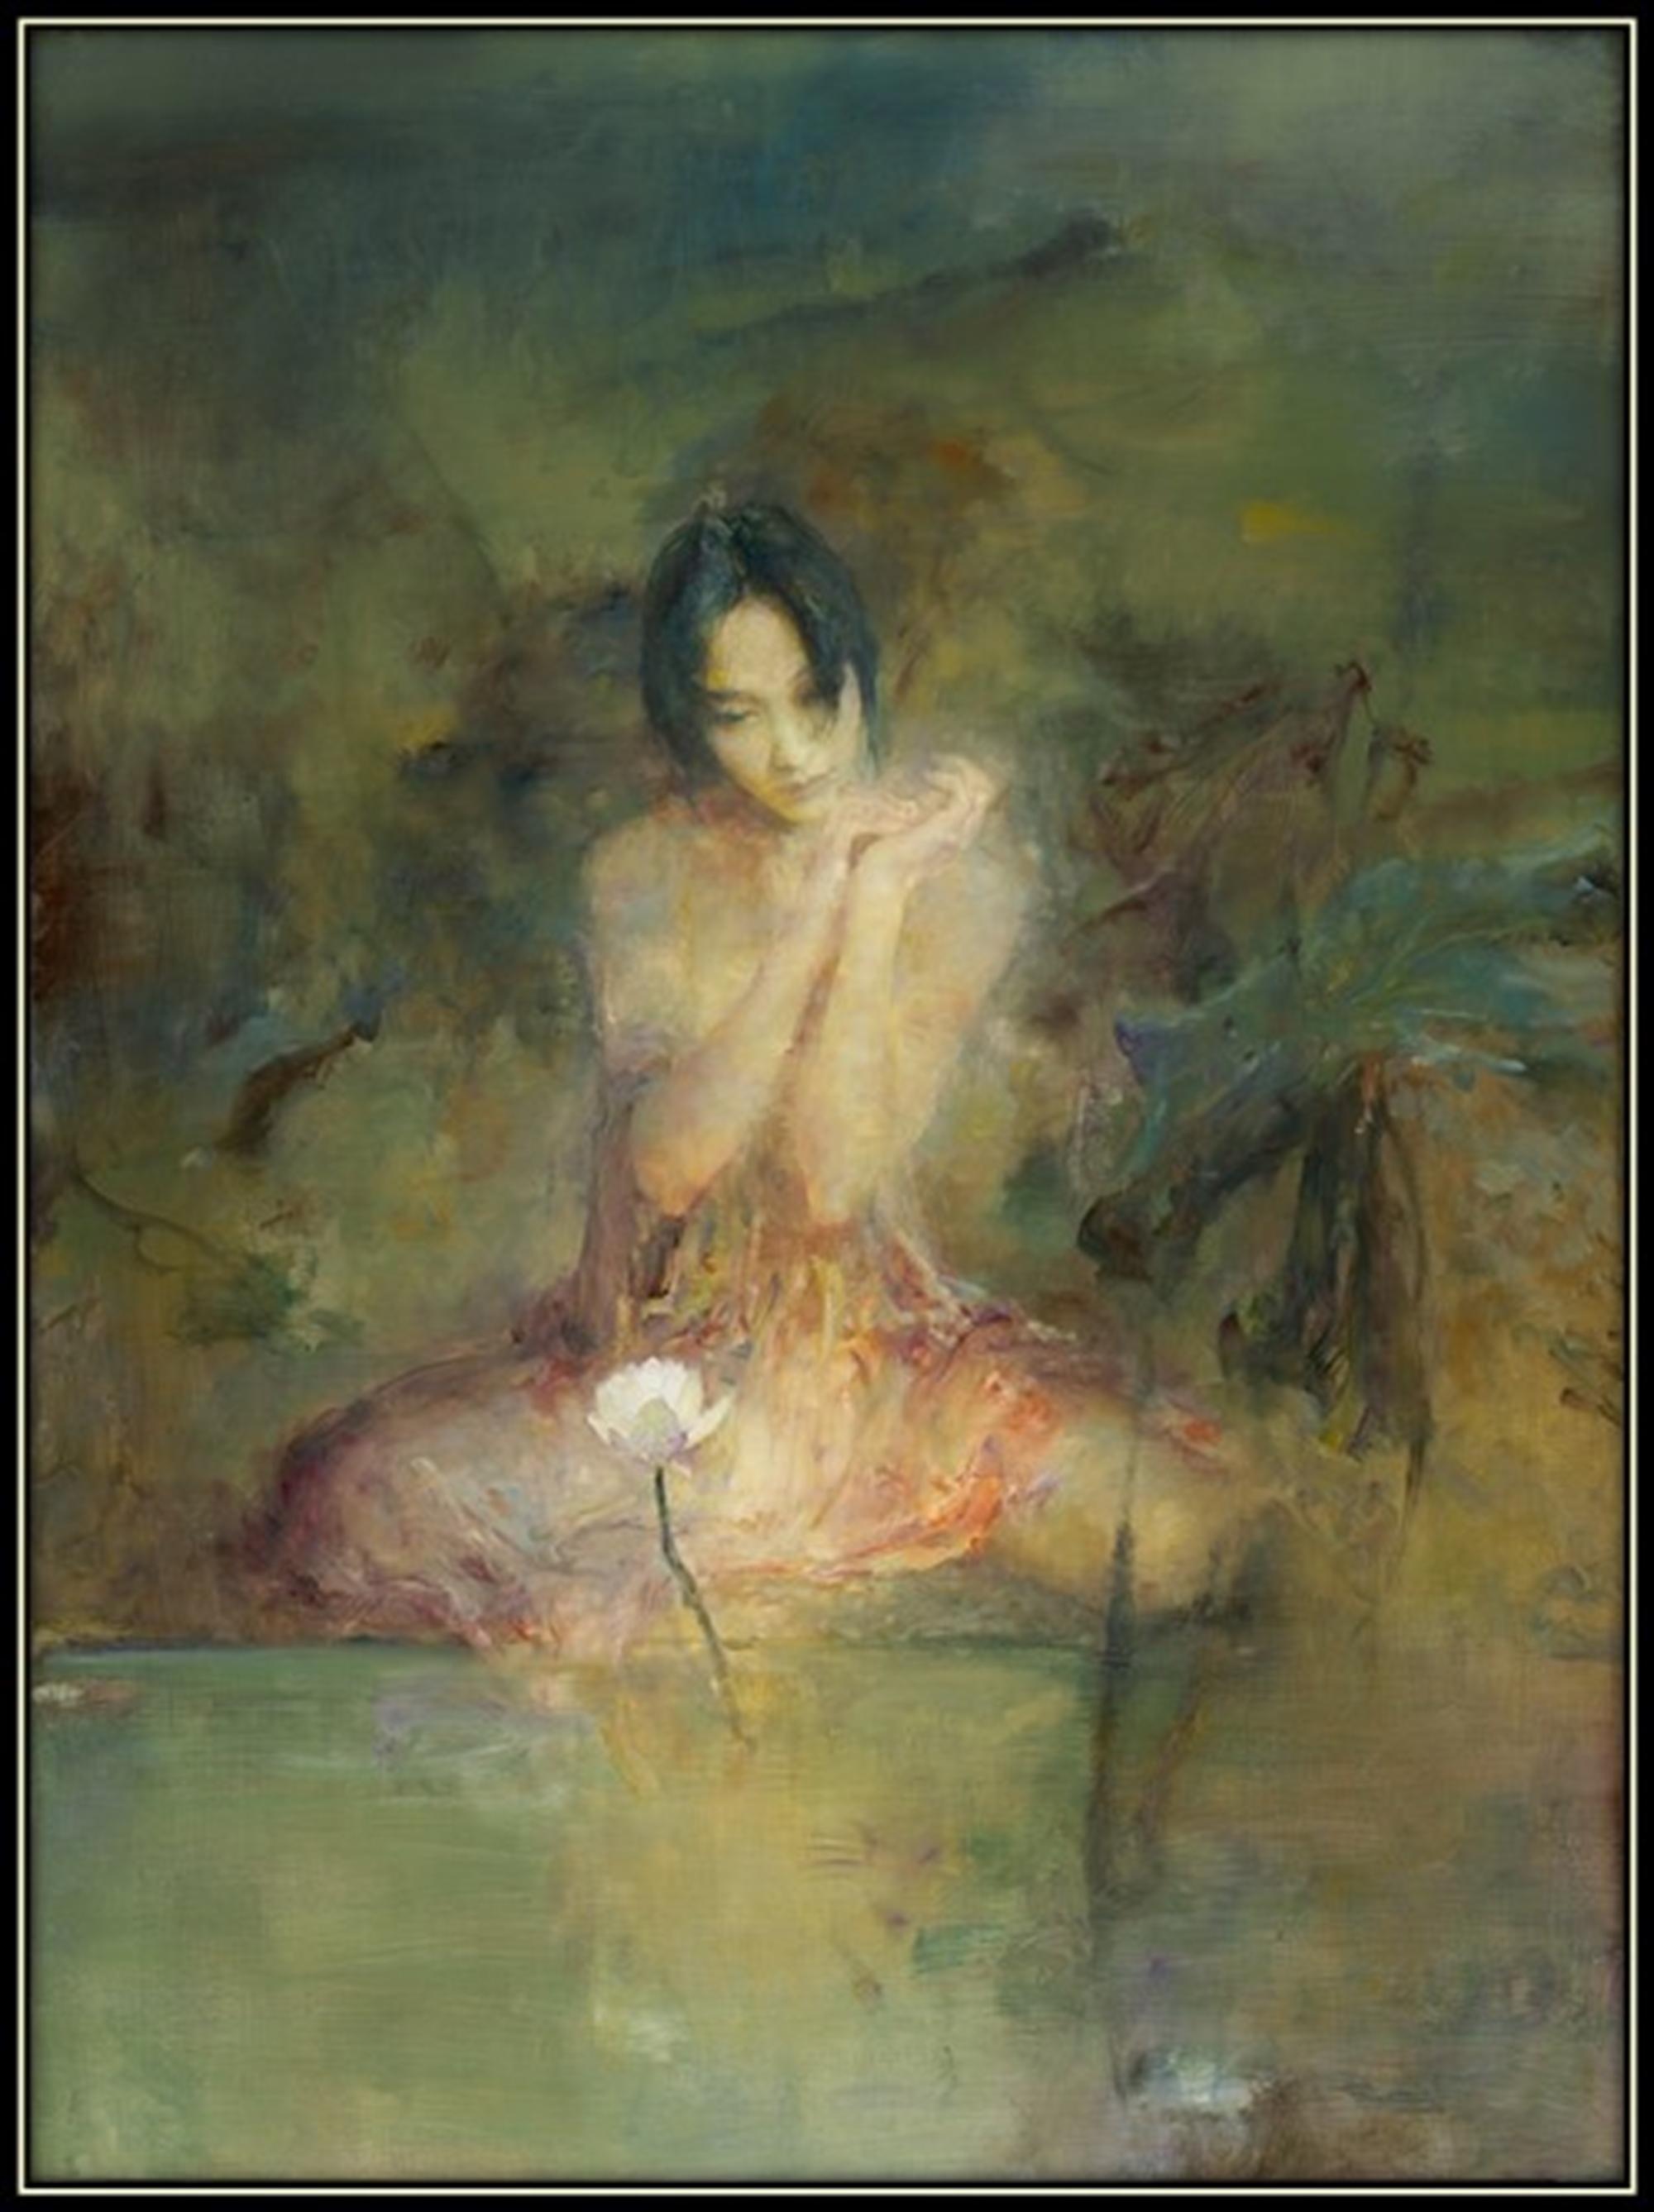 Day Dream by the Lotus by Hu Jun Di